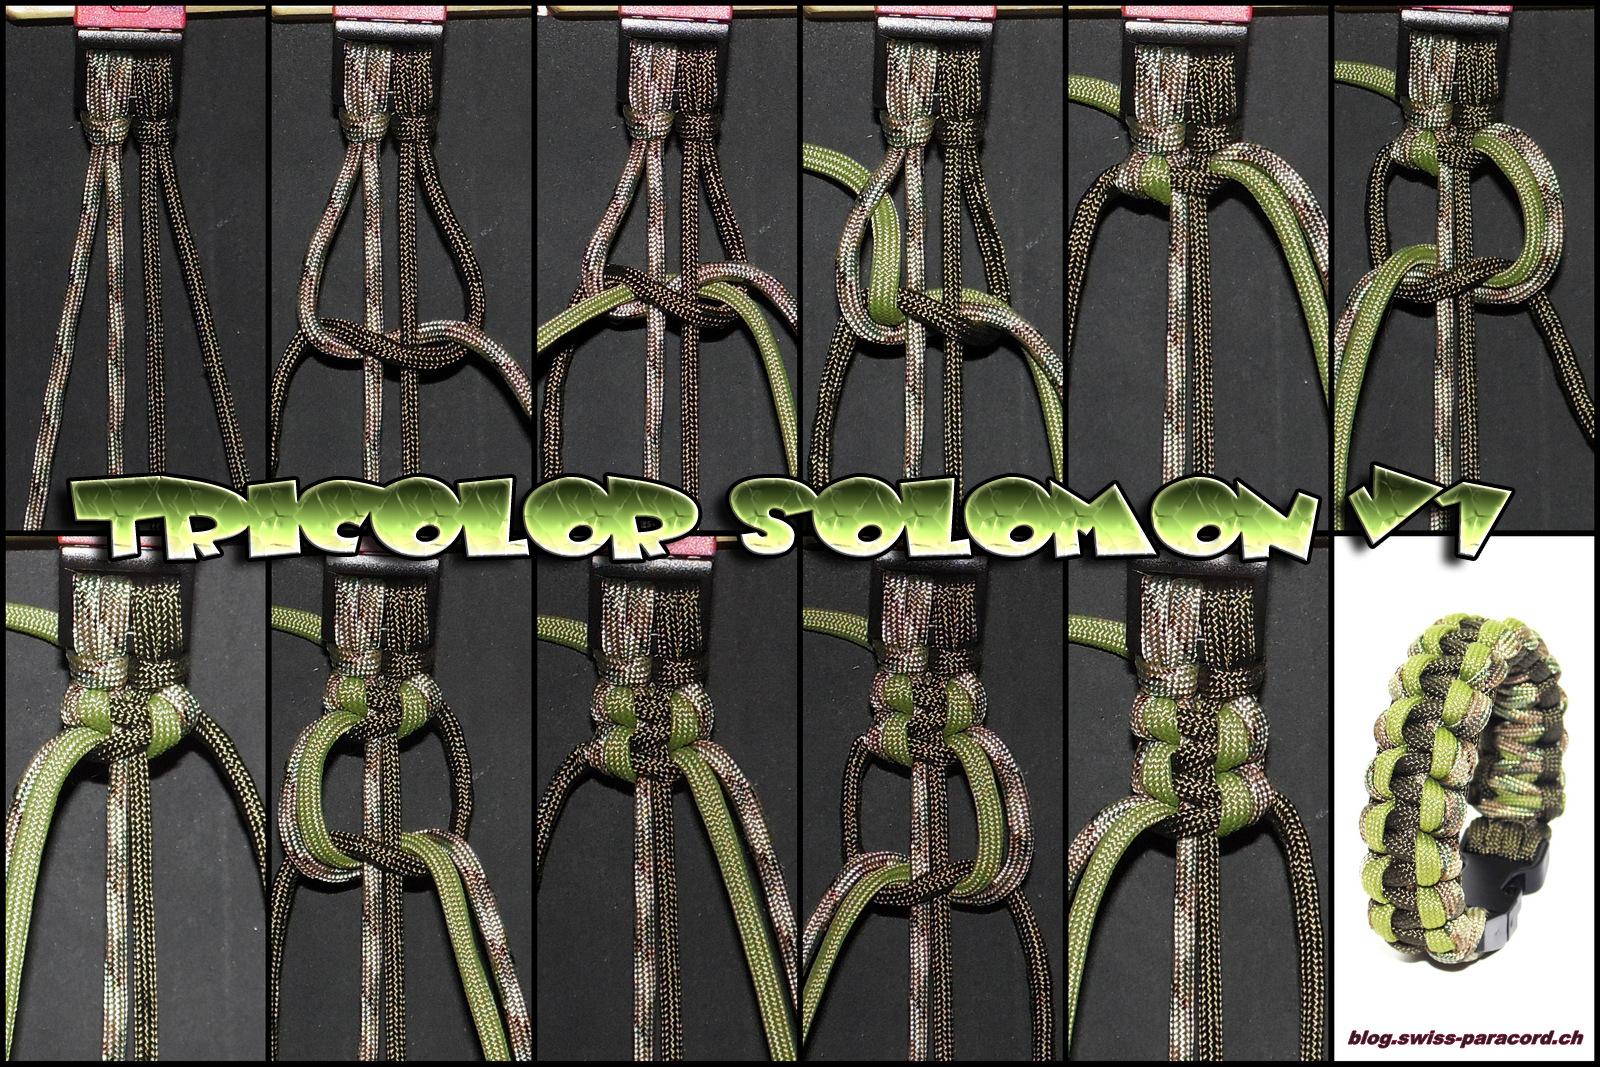 tricolor solomon v1 gorilla v1 tutorial swiss paracord